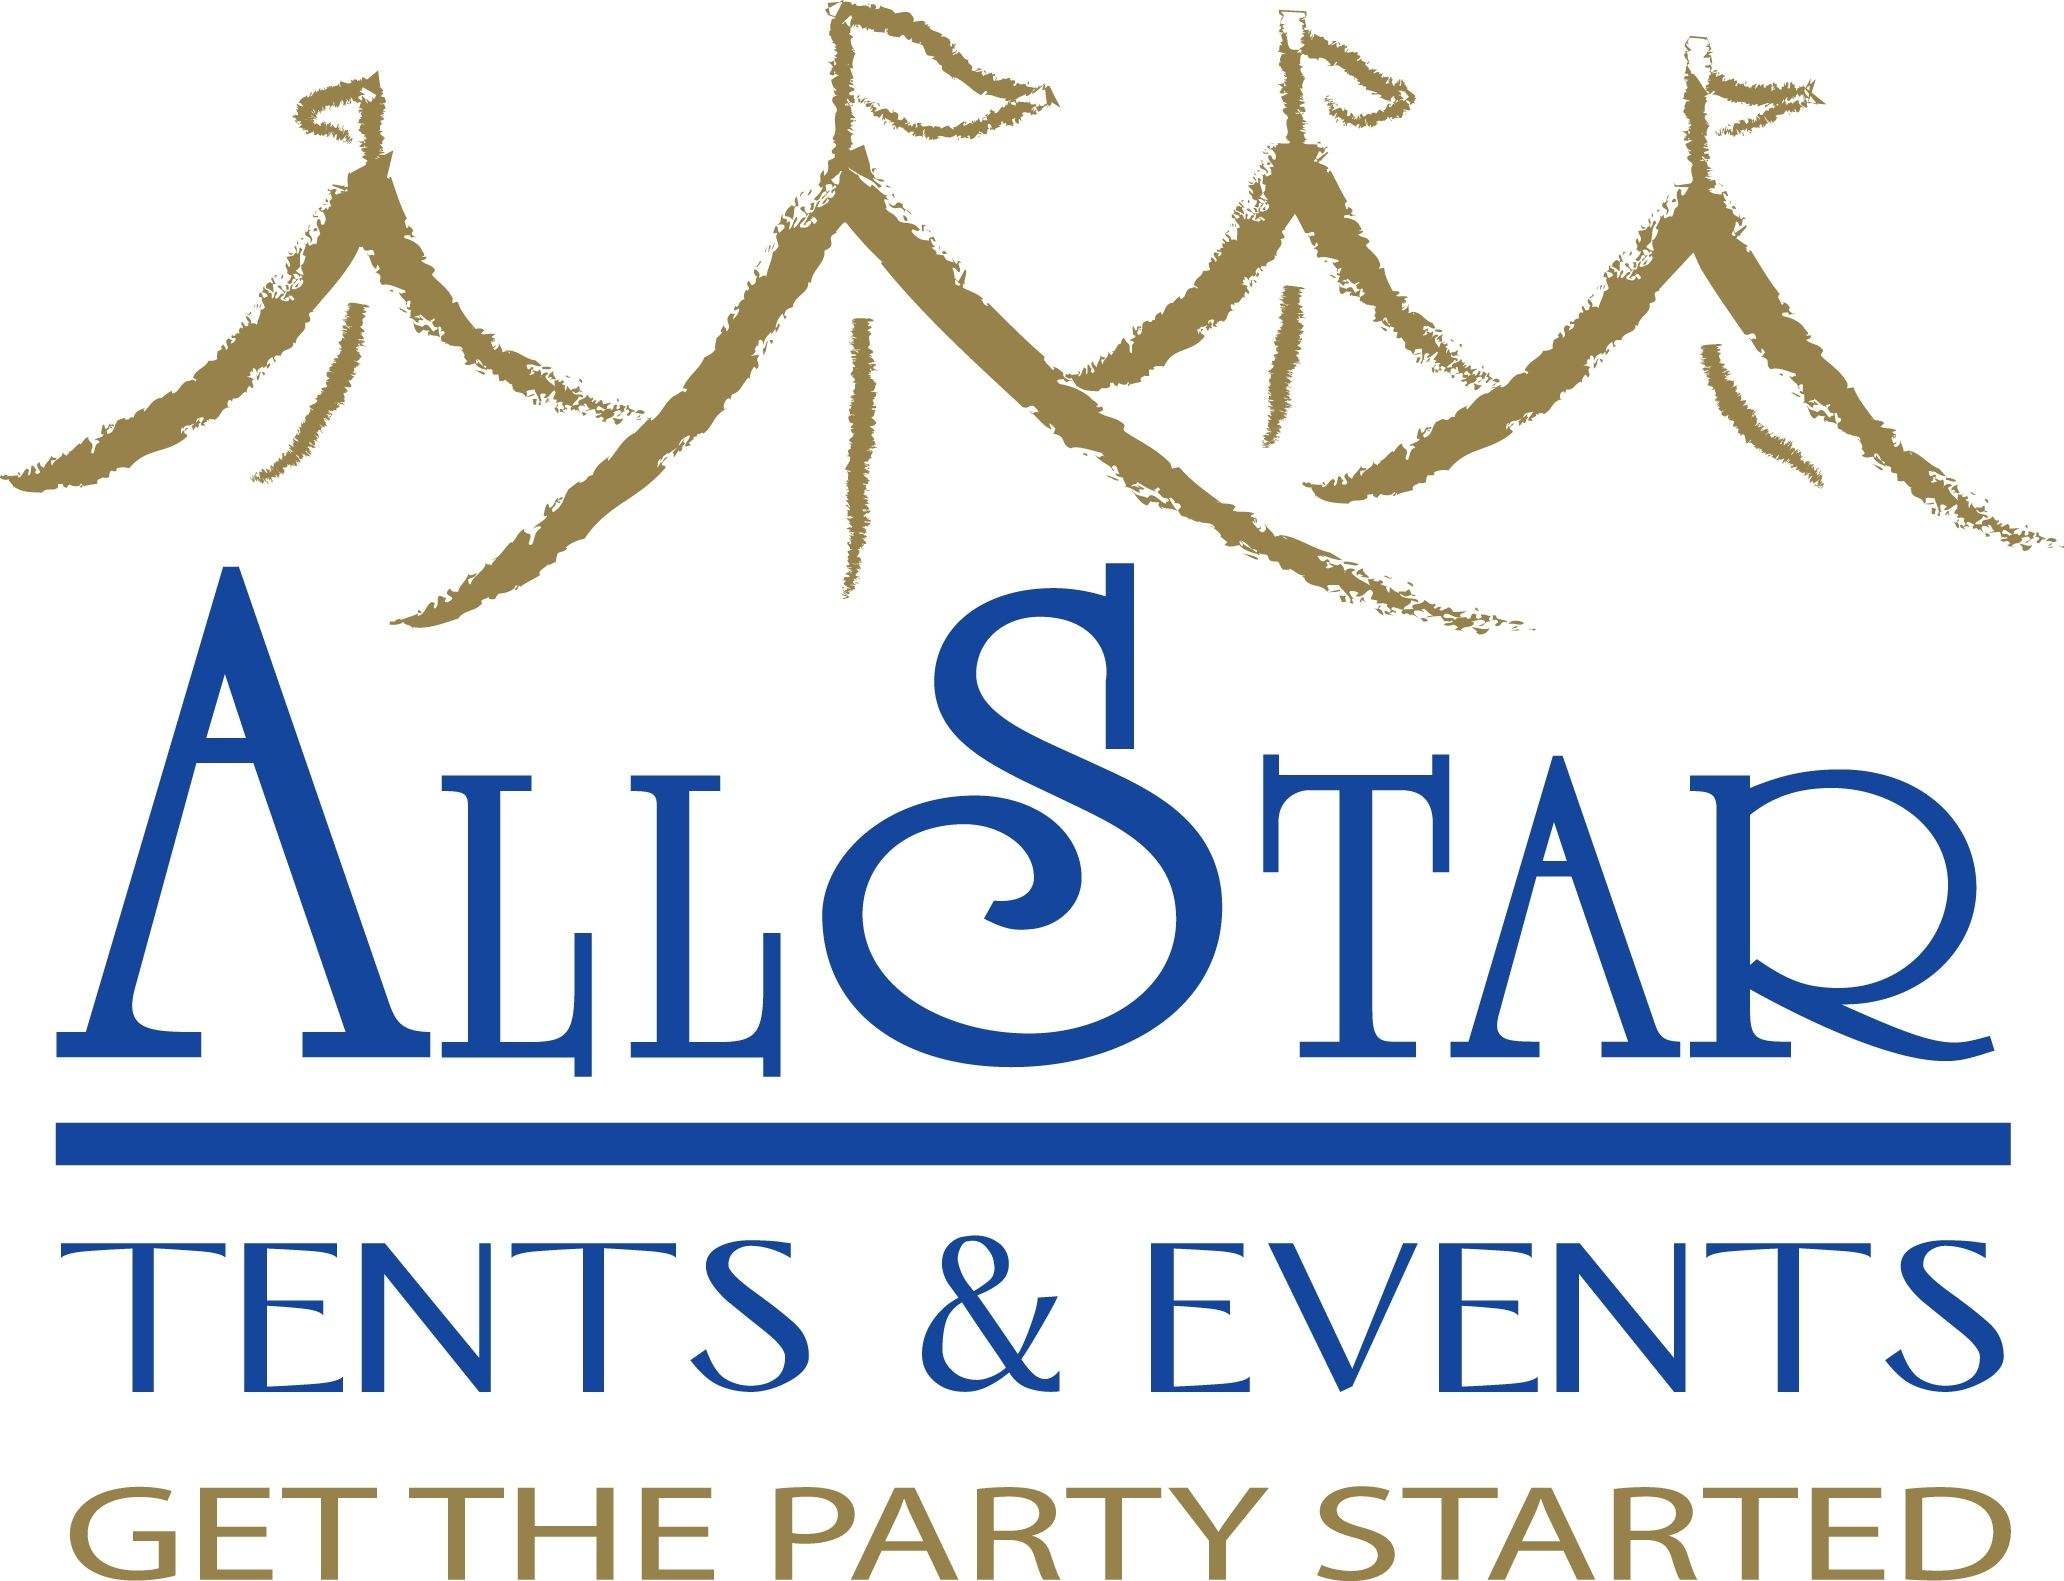 Event Tent Icon.